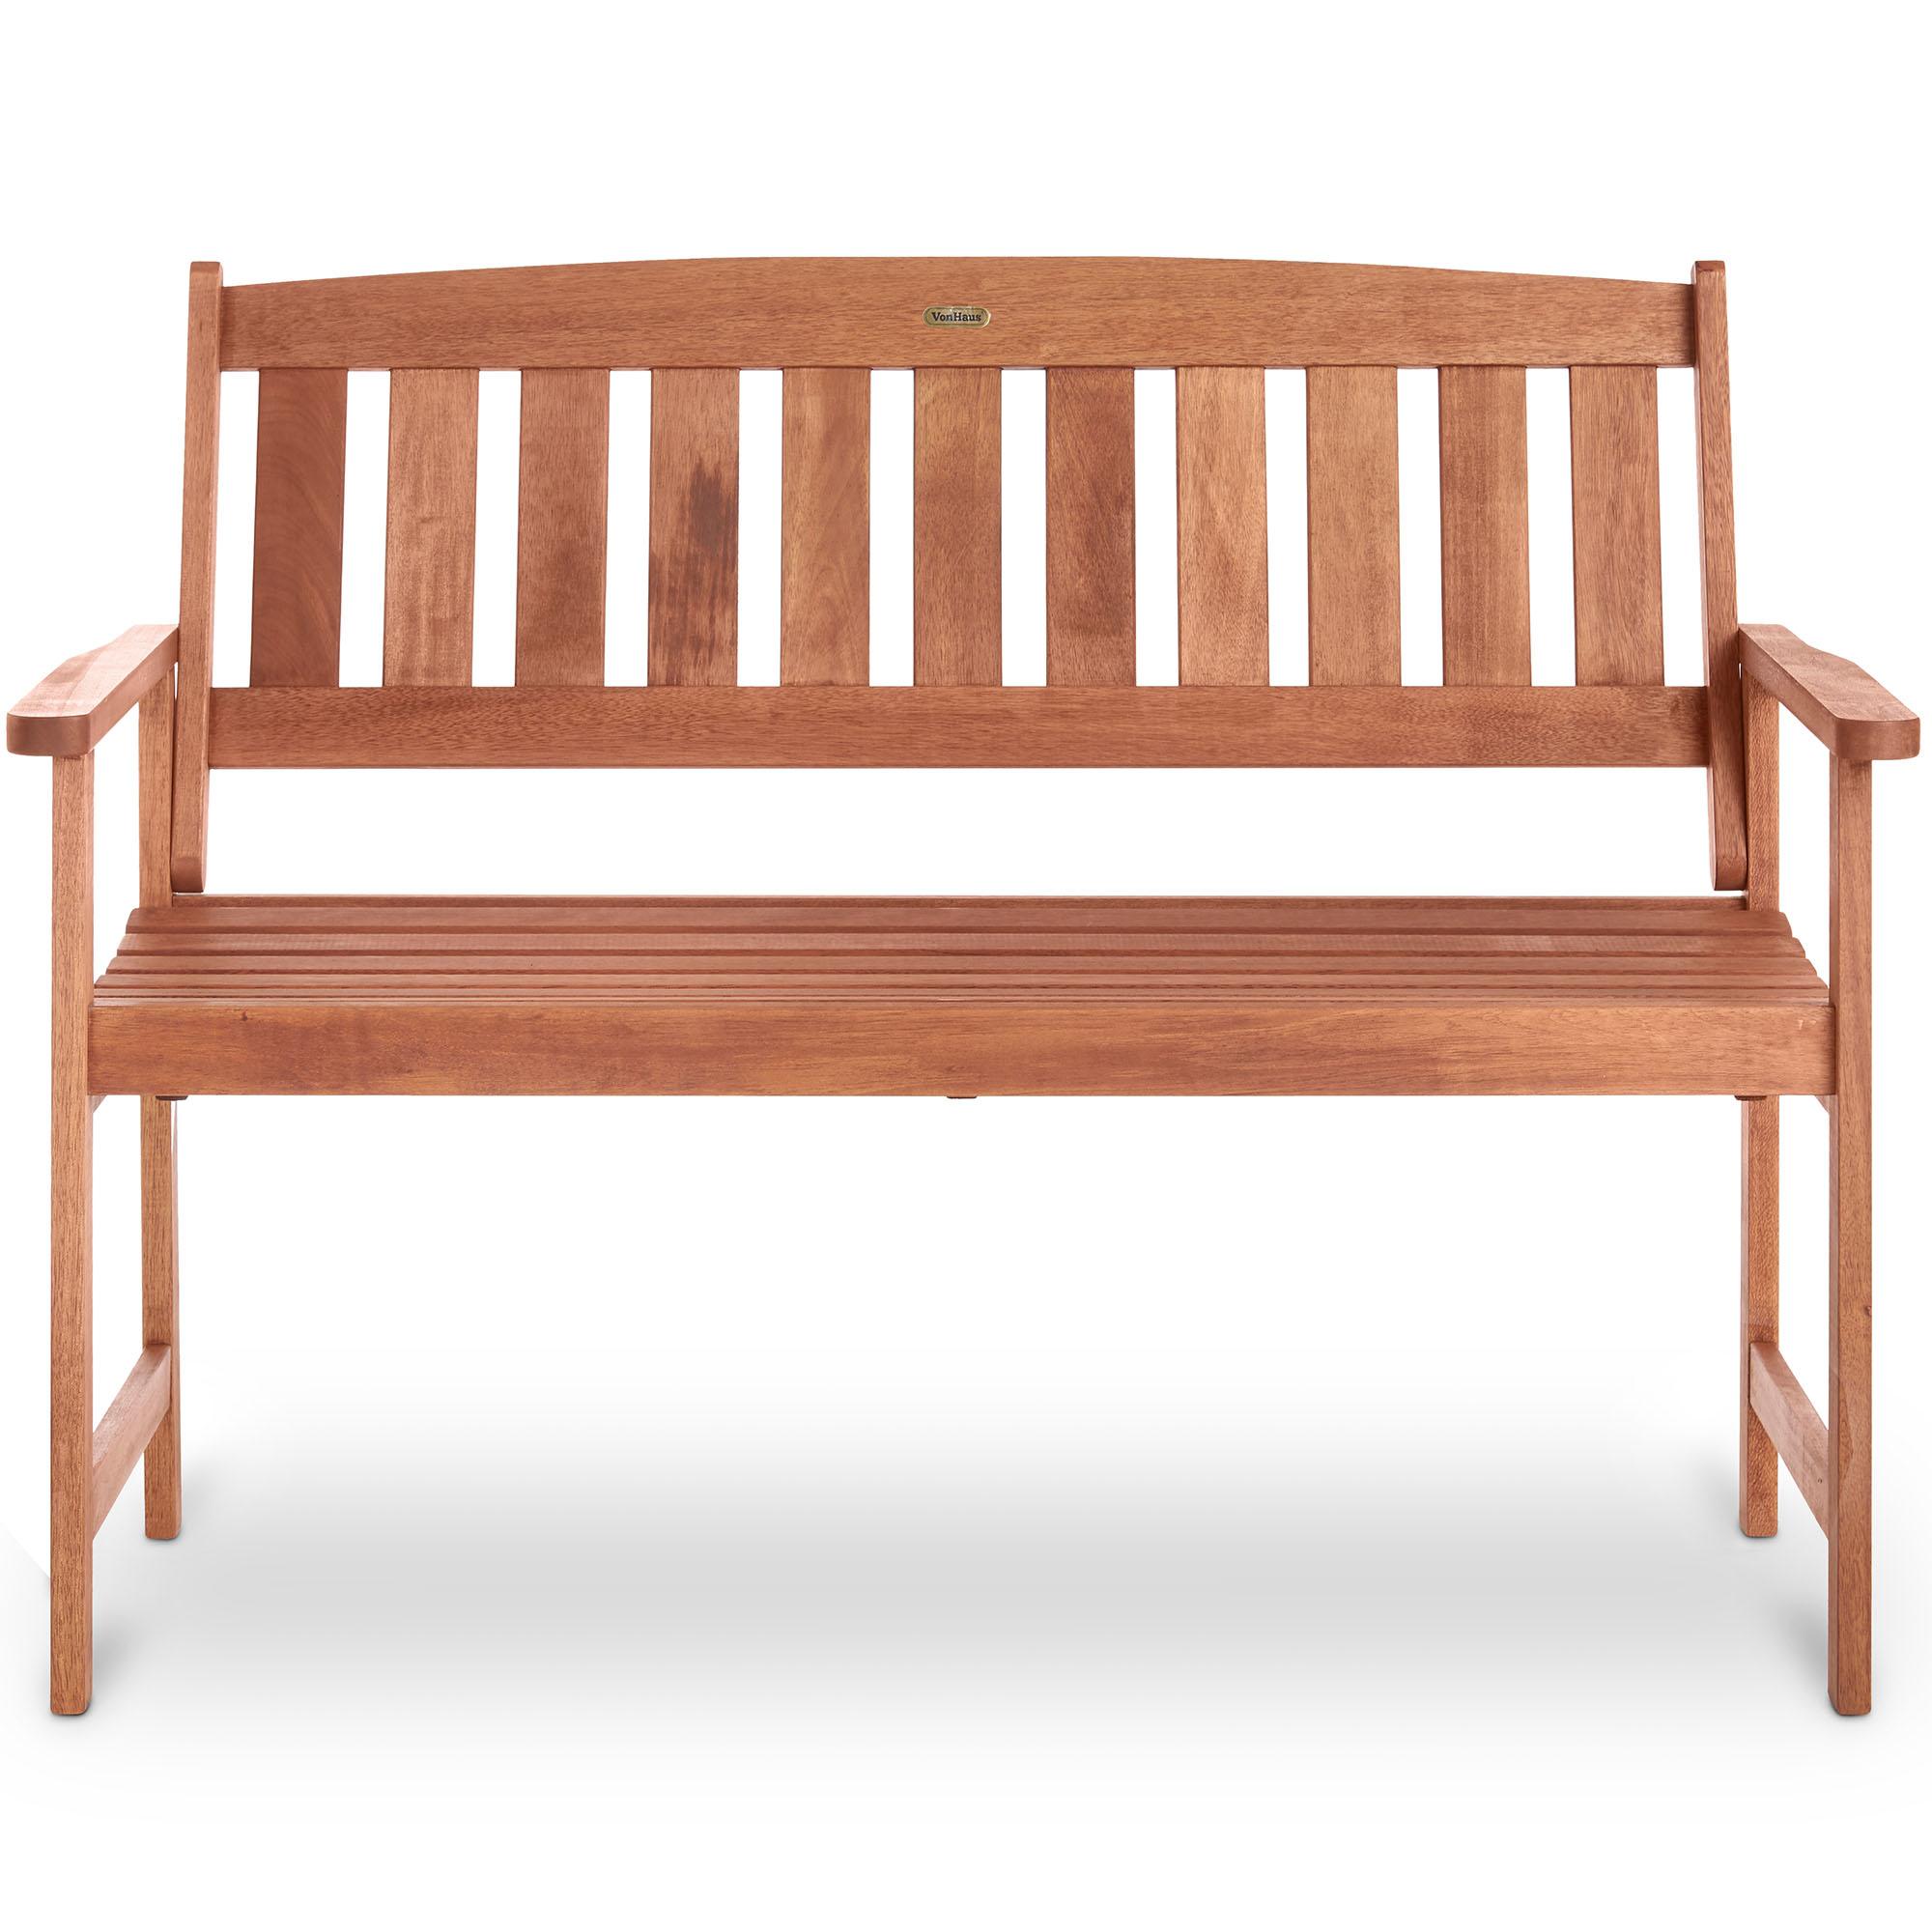 Wooden Garden Bench Teak 2 Seat Bench Kit 28 Images Sandwick Winawood 2 Seater Wood Effect